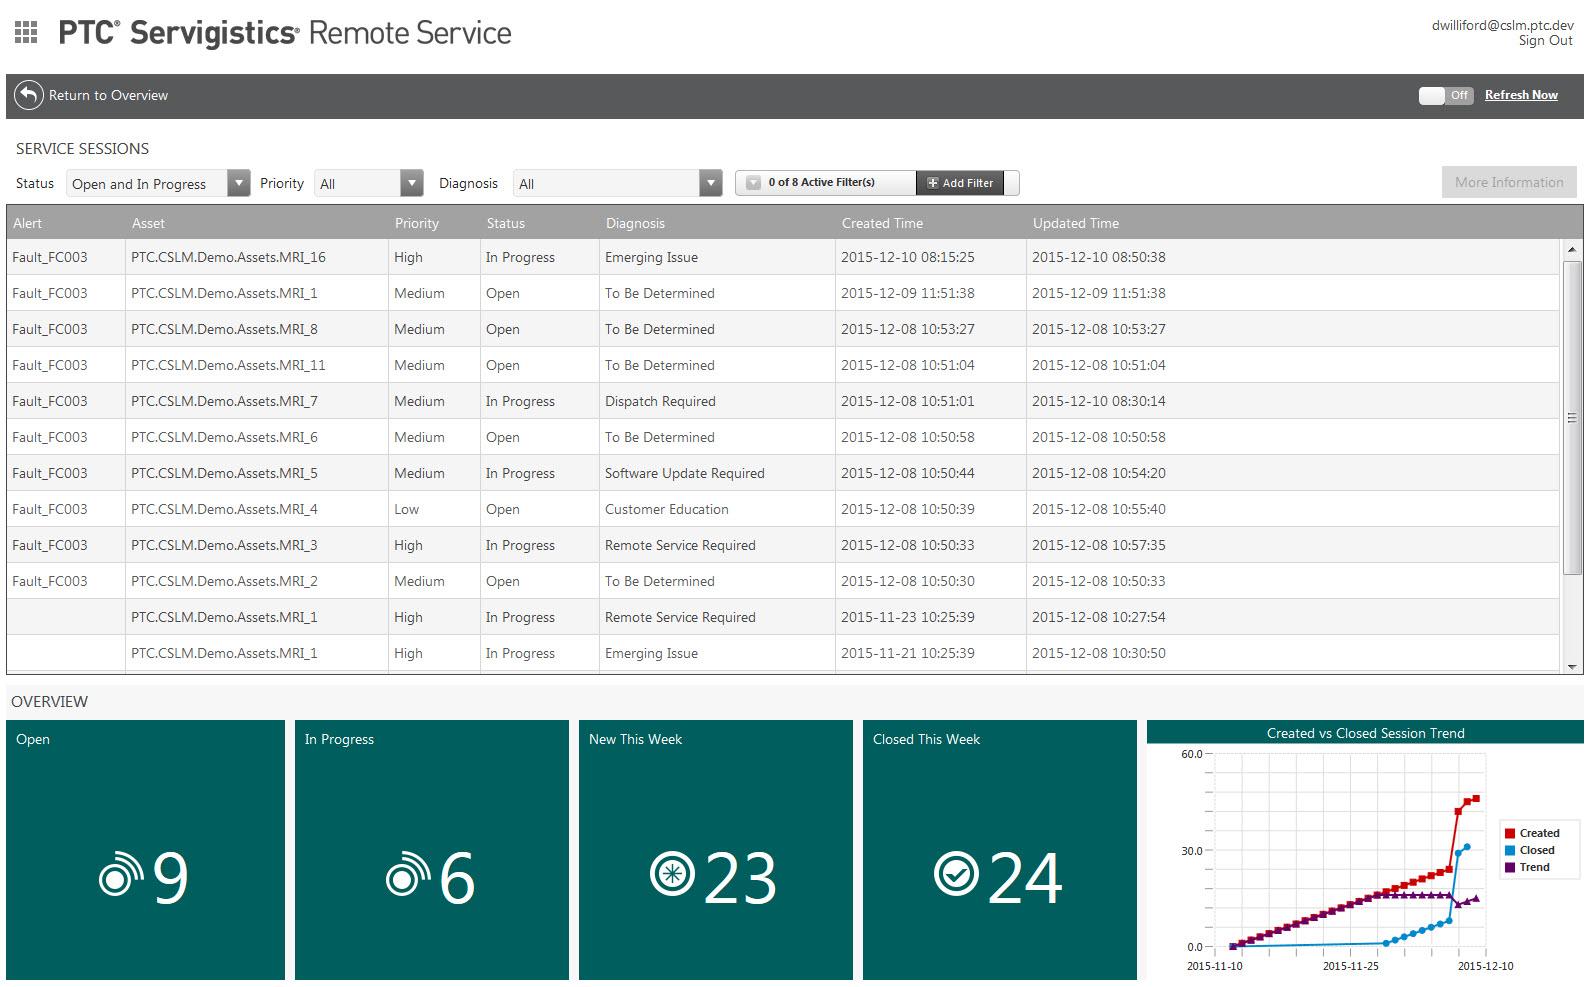 RemoteService-HomePage.jpg